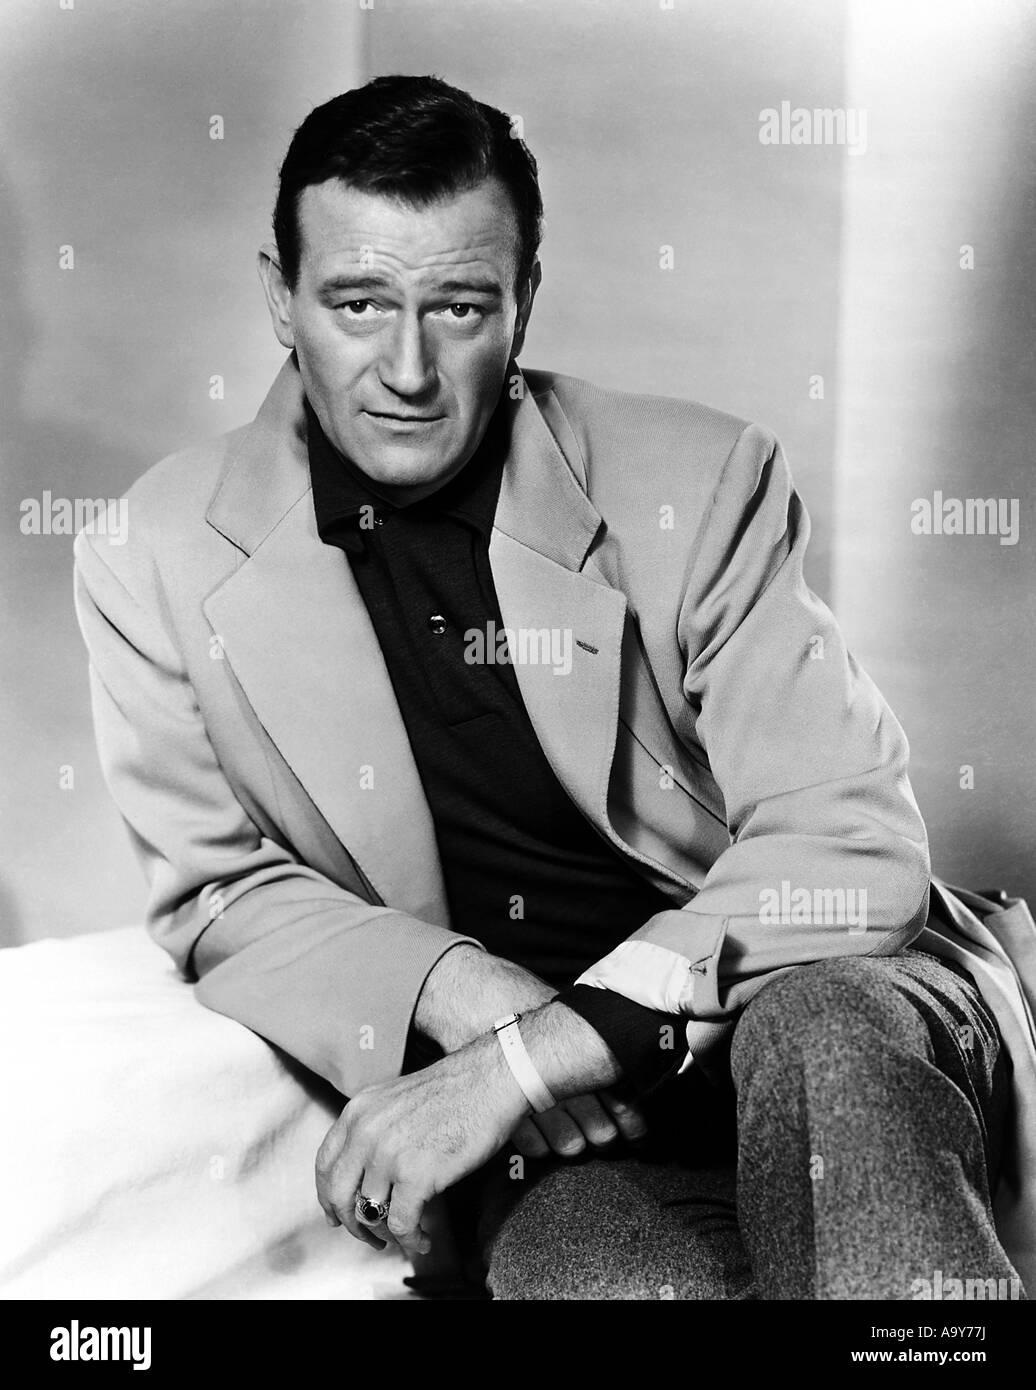 JOHN WAYNE - US film actor - Stock Image